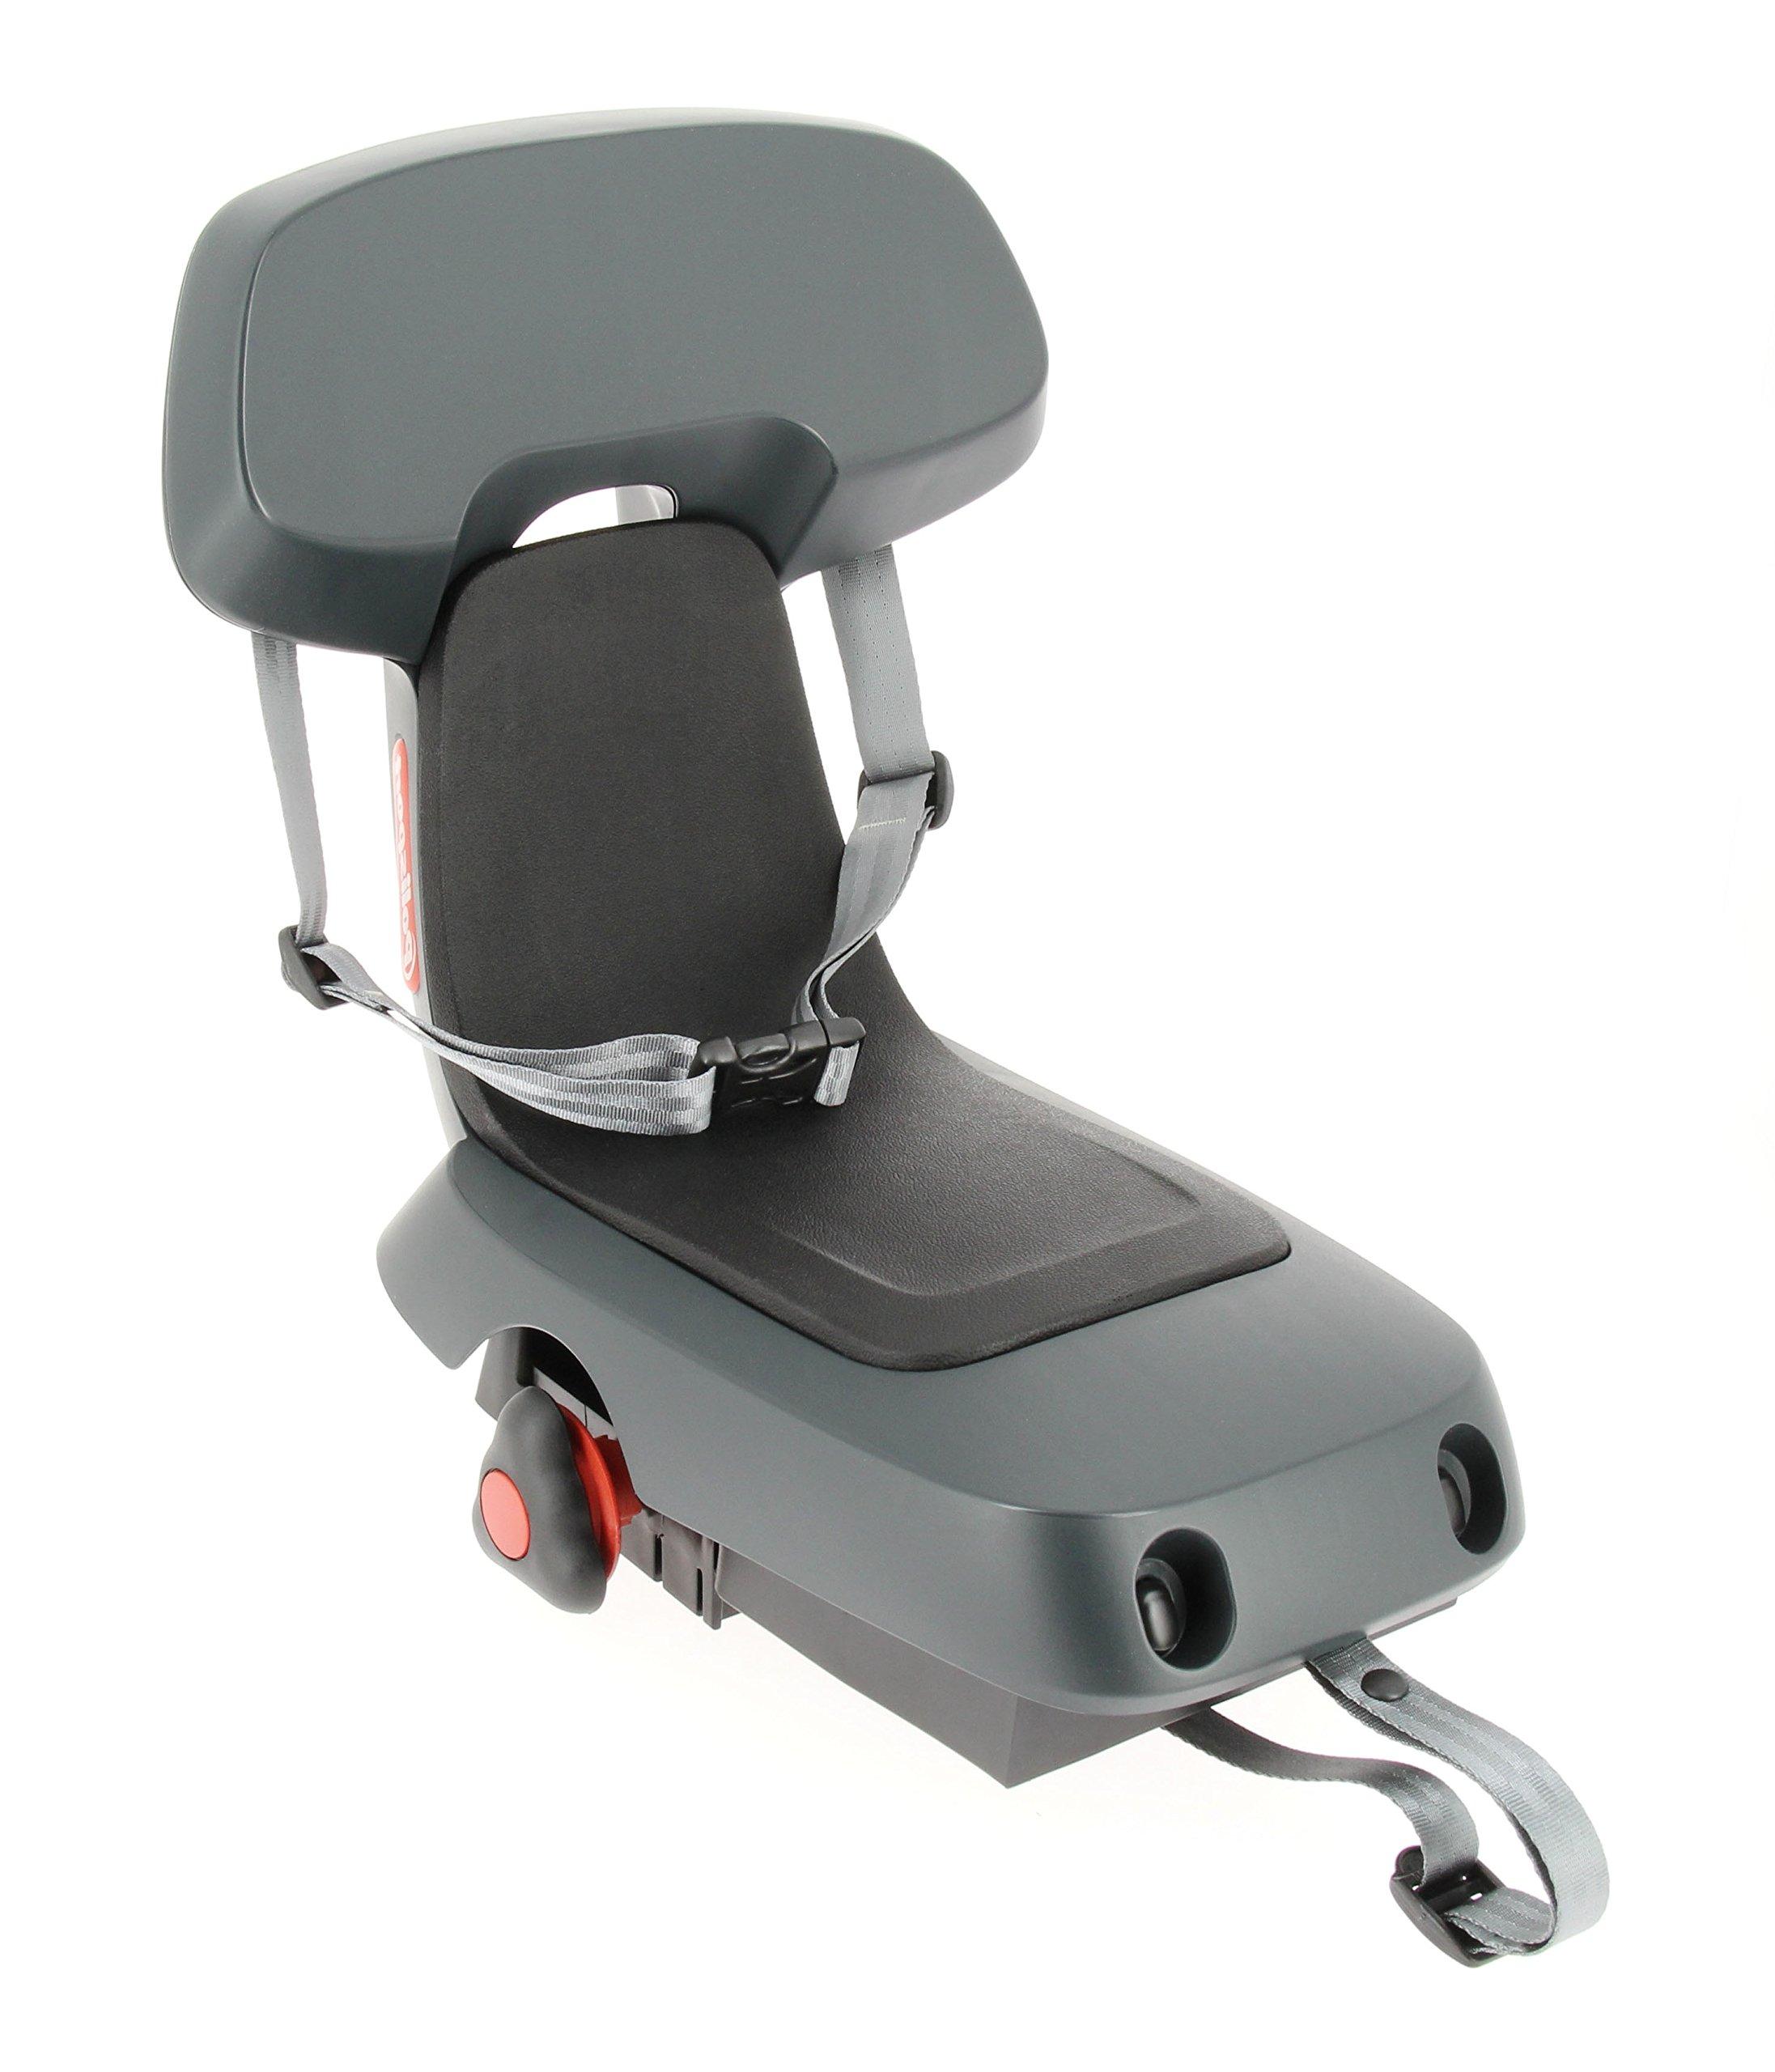 Polisport Guppy Junior silla de bici 1